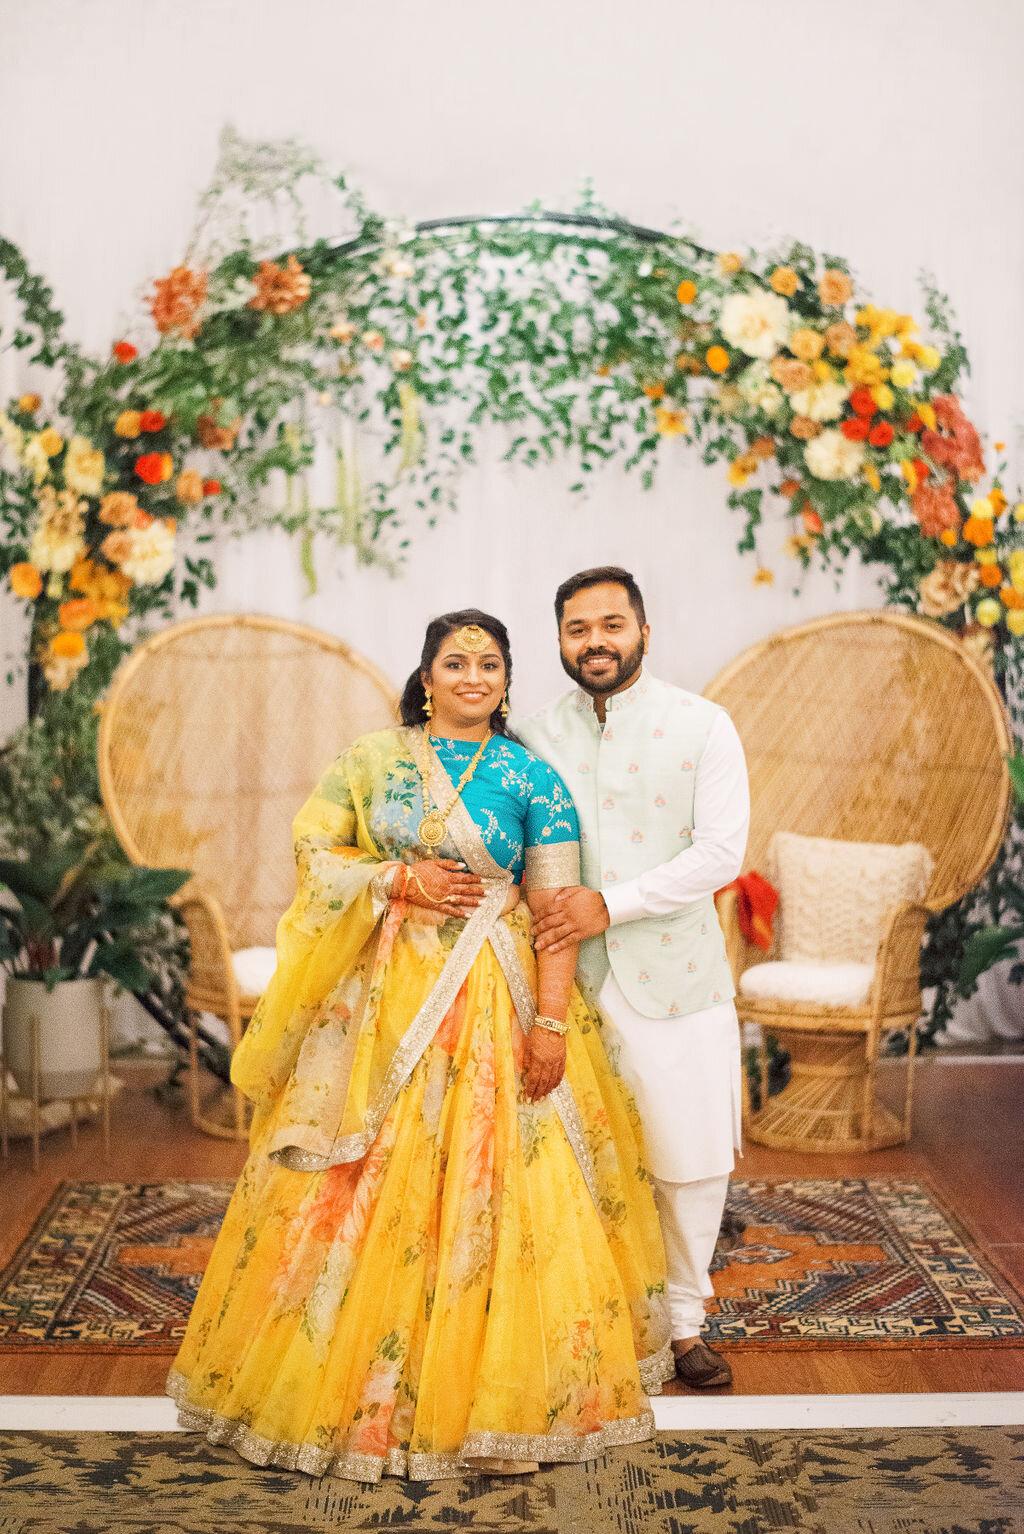 Alexandra-Elise-Photography-Ali-Reed-Film-Indian-Wedding-Photographer-Rochester-New-York-Highlights-006.jpg